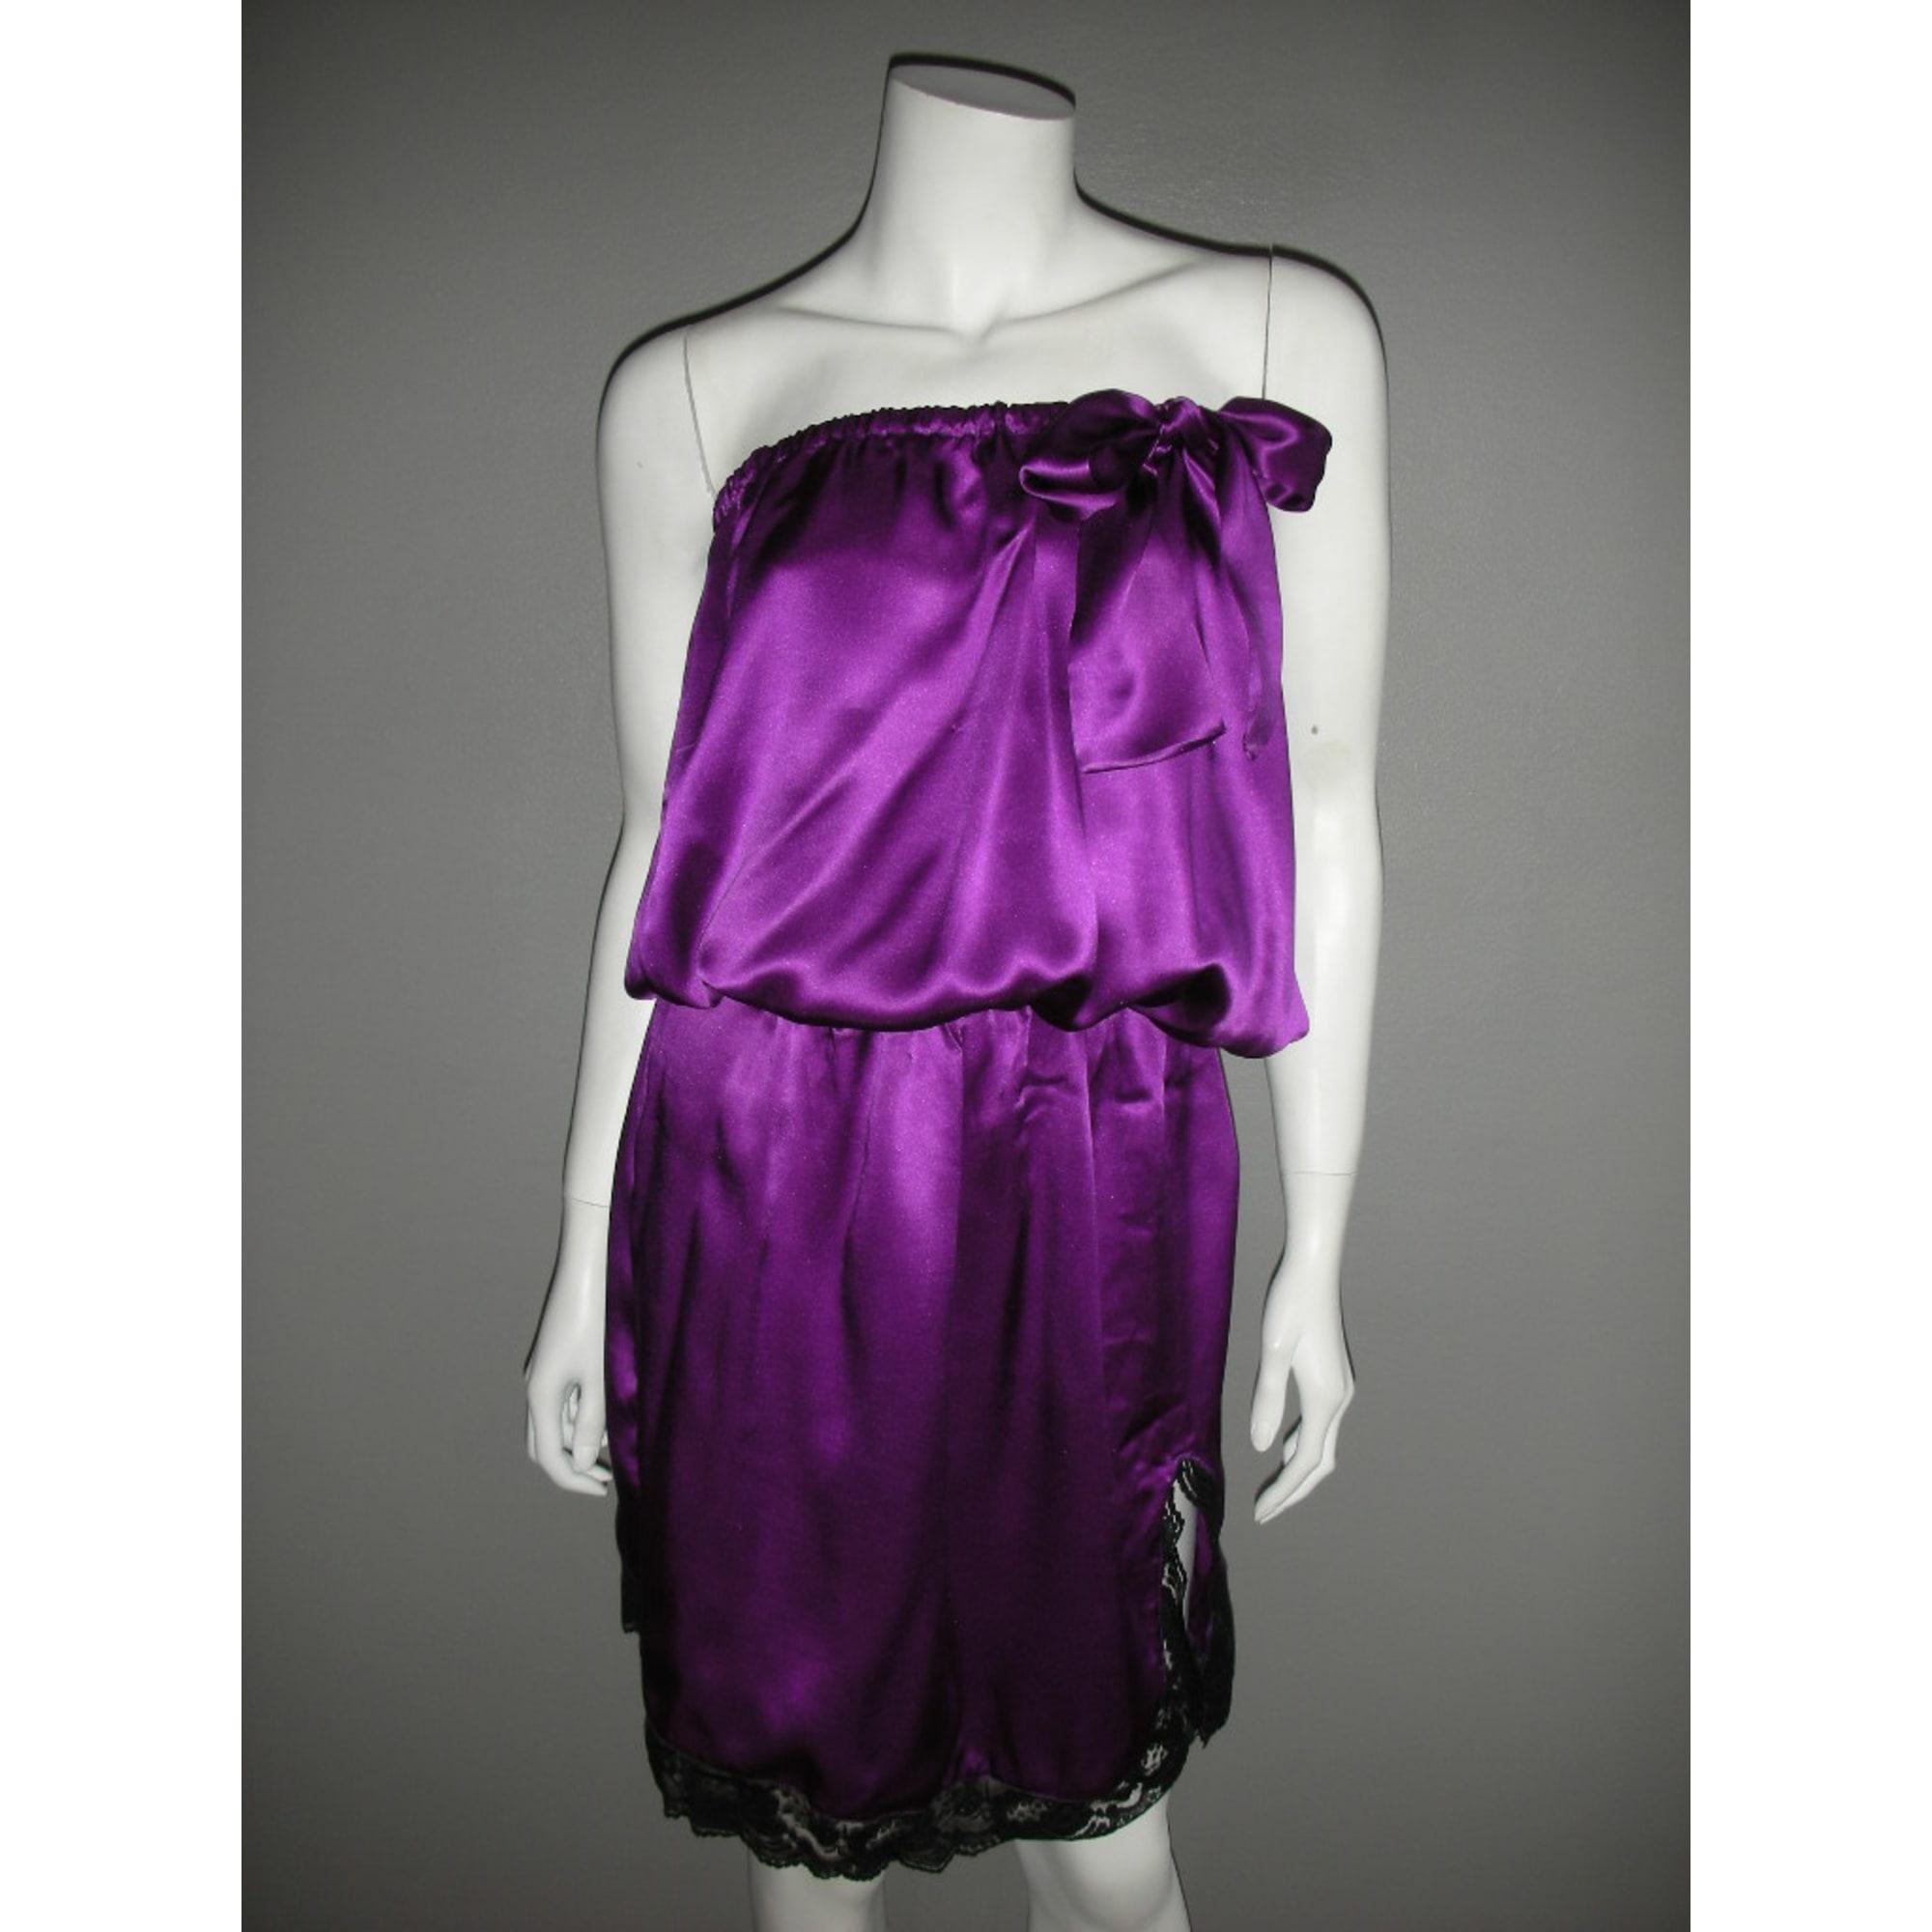 Robe bustier MHAND'S HOPE Violet, mauve, lavande